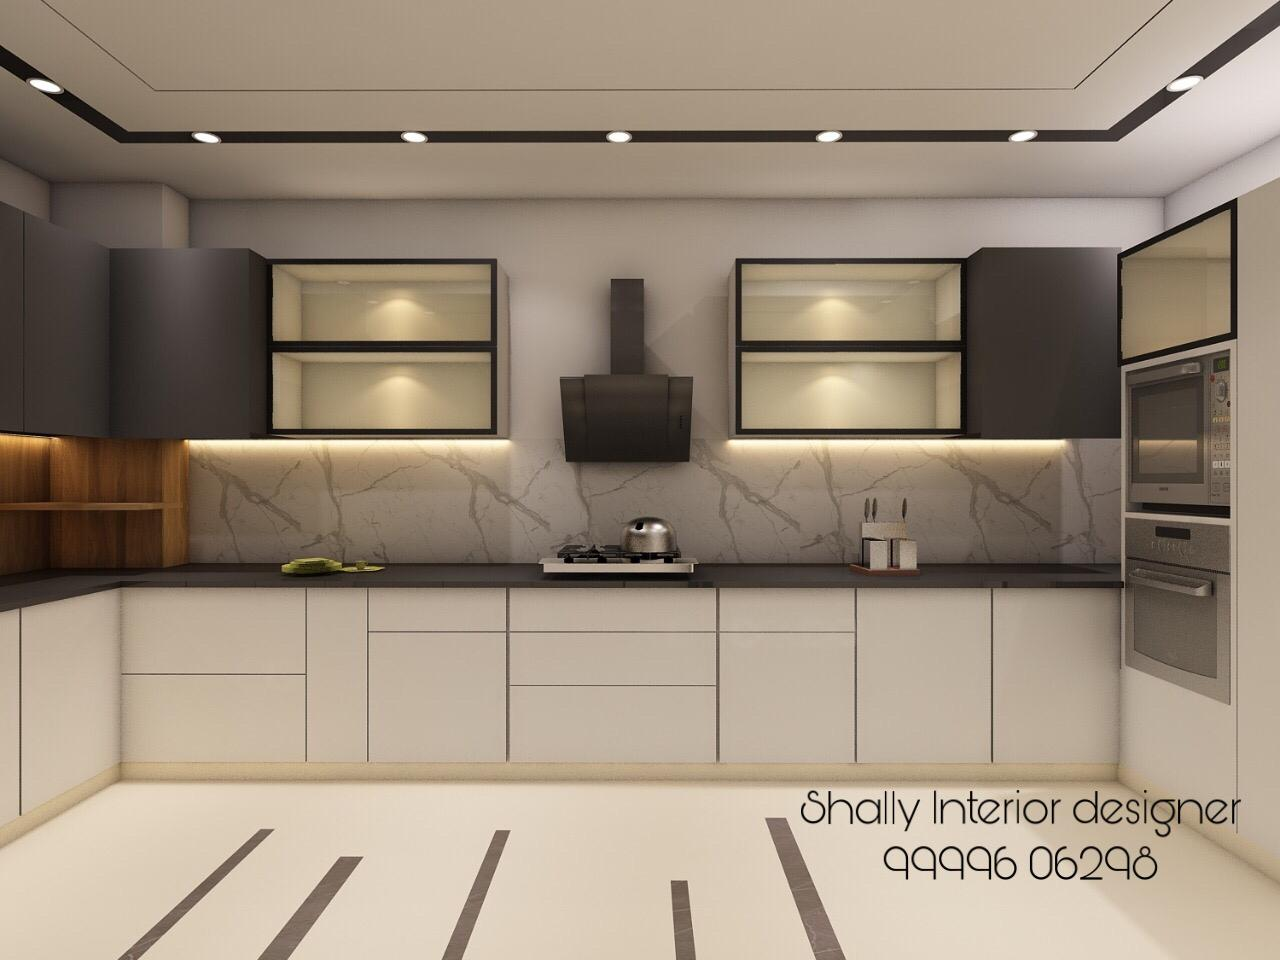 Kitchen Interior Design in Mumbai, Kitchen Interior Designer in Mumbai